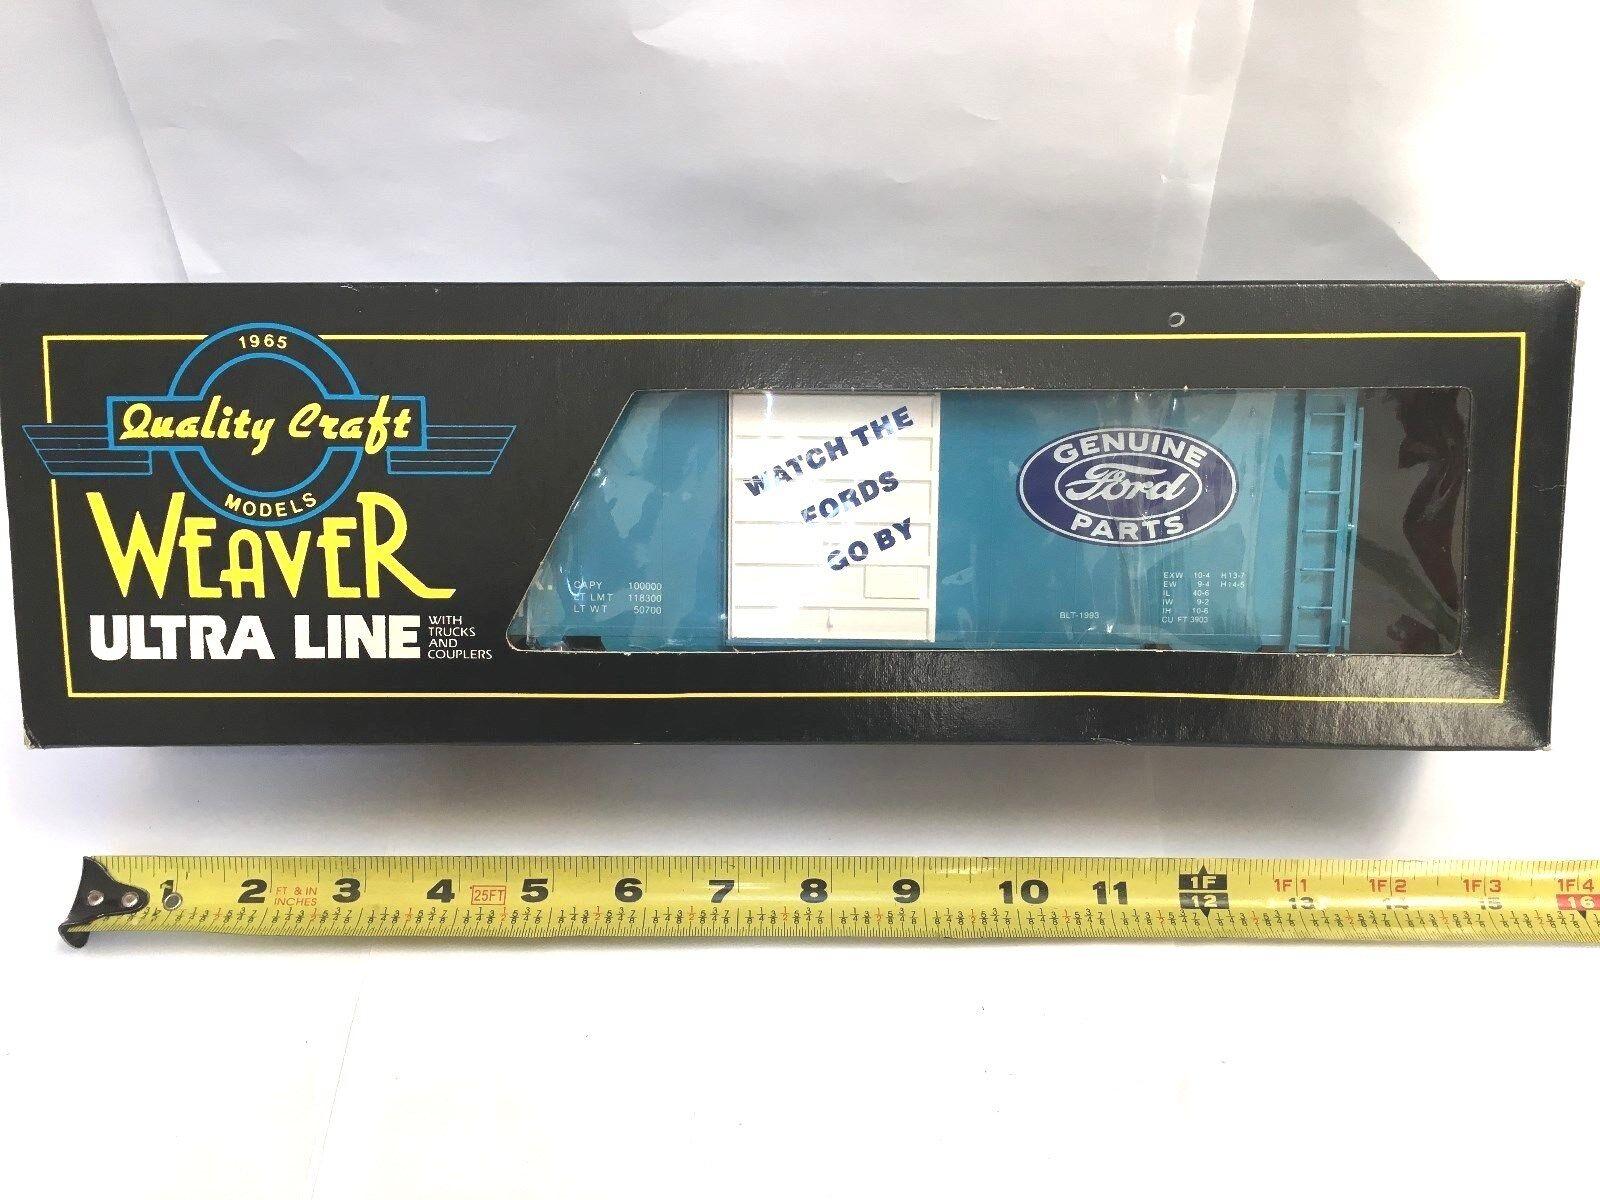 WEAVER ULTRA LINE RAILERS GENUINE FORD PARTS blu SIDE BOX CAR